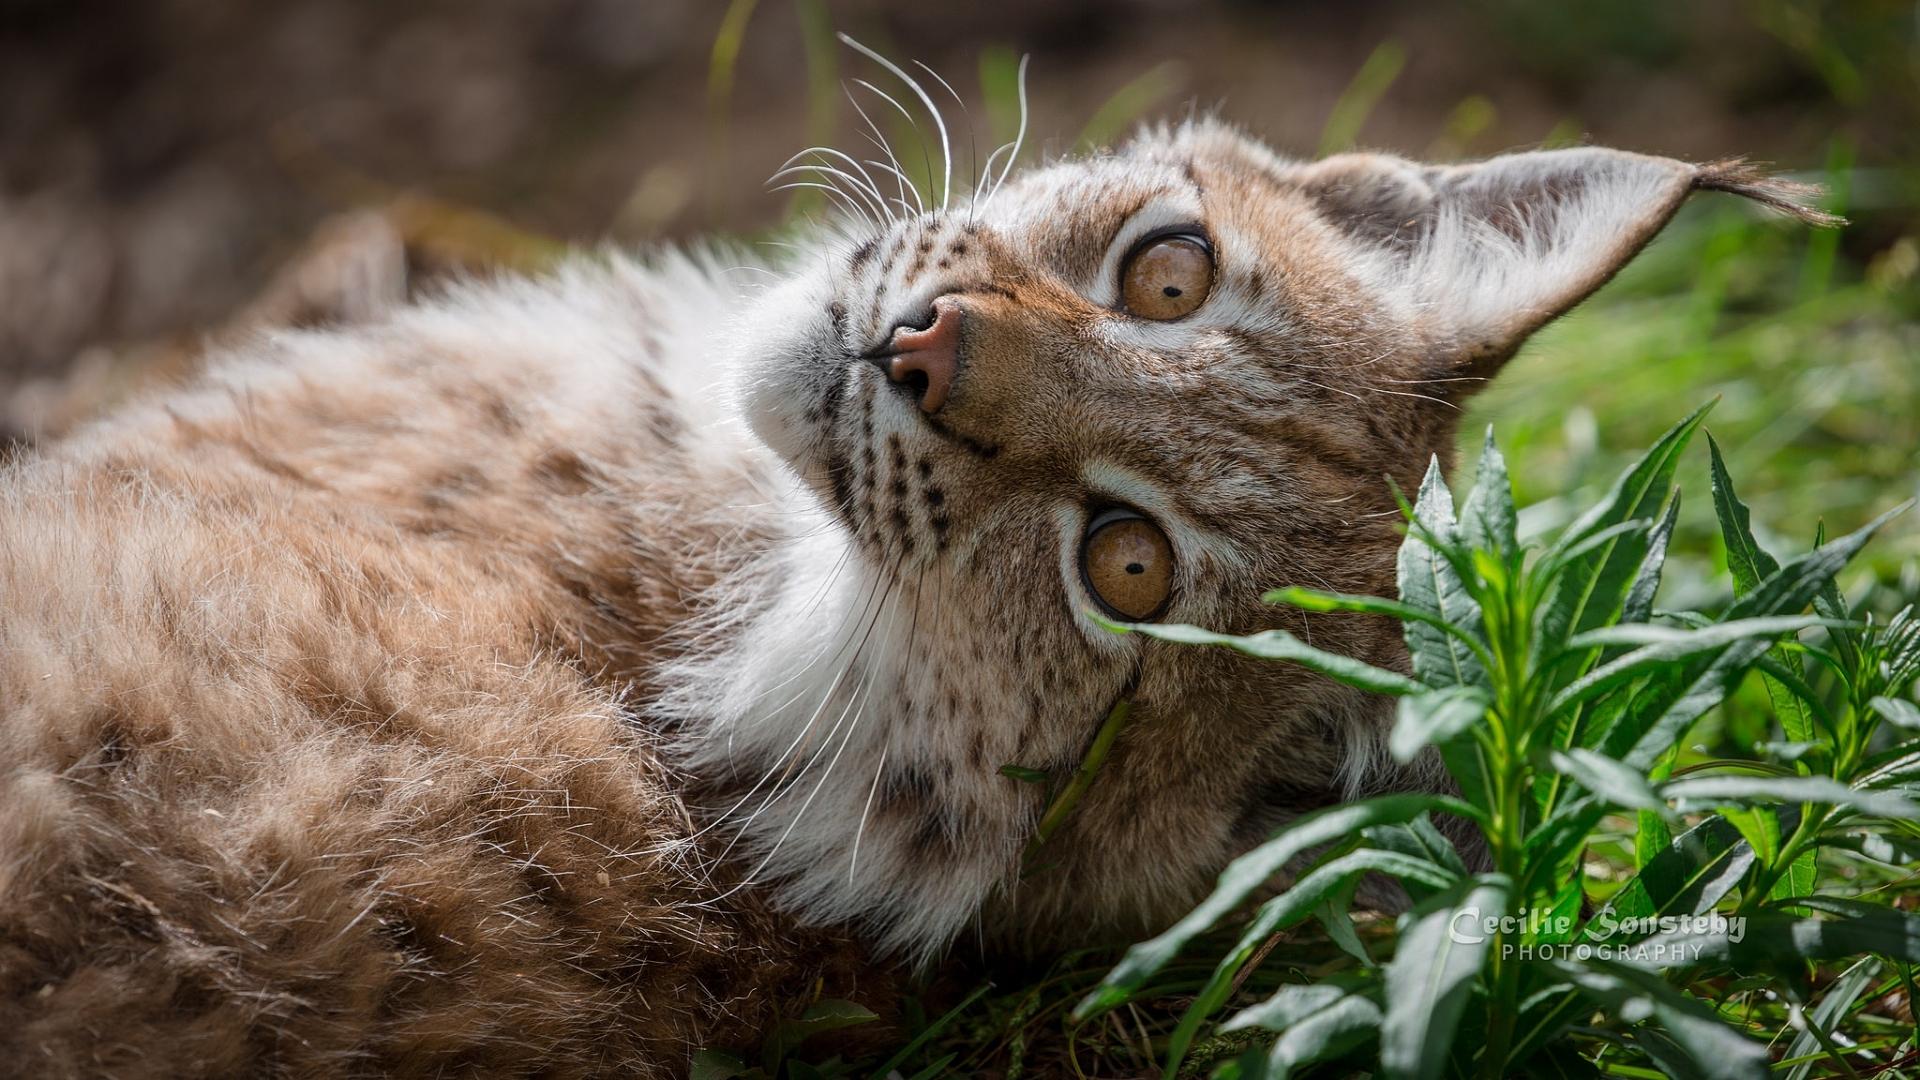 Картинка: Рысь, морда, глаза, ушки, трава, отдыхает, фотограф, Cecilie Sonsteby